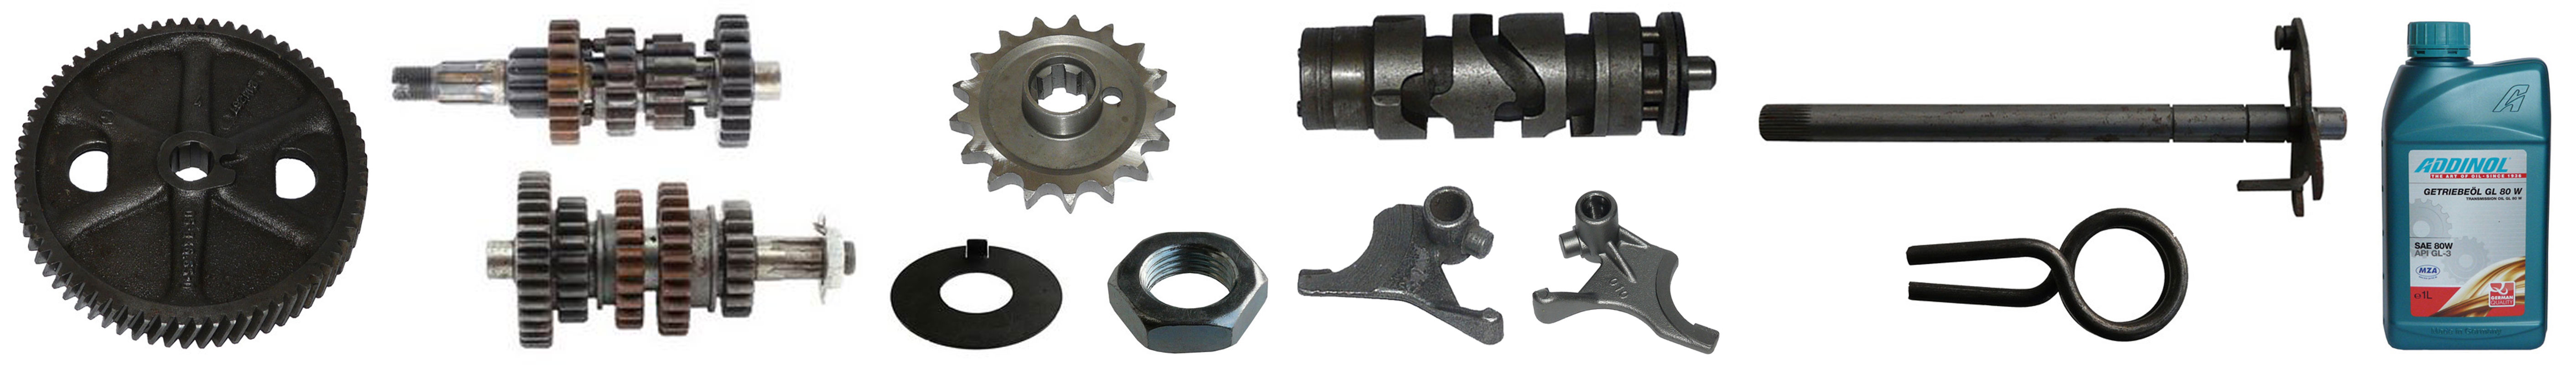 MZ ETZ 250 Ersatzteile Motor Getriebe Schaltung